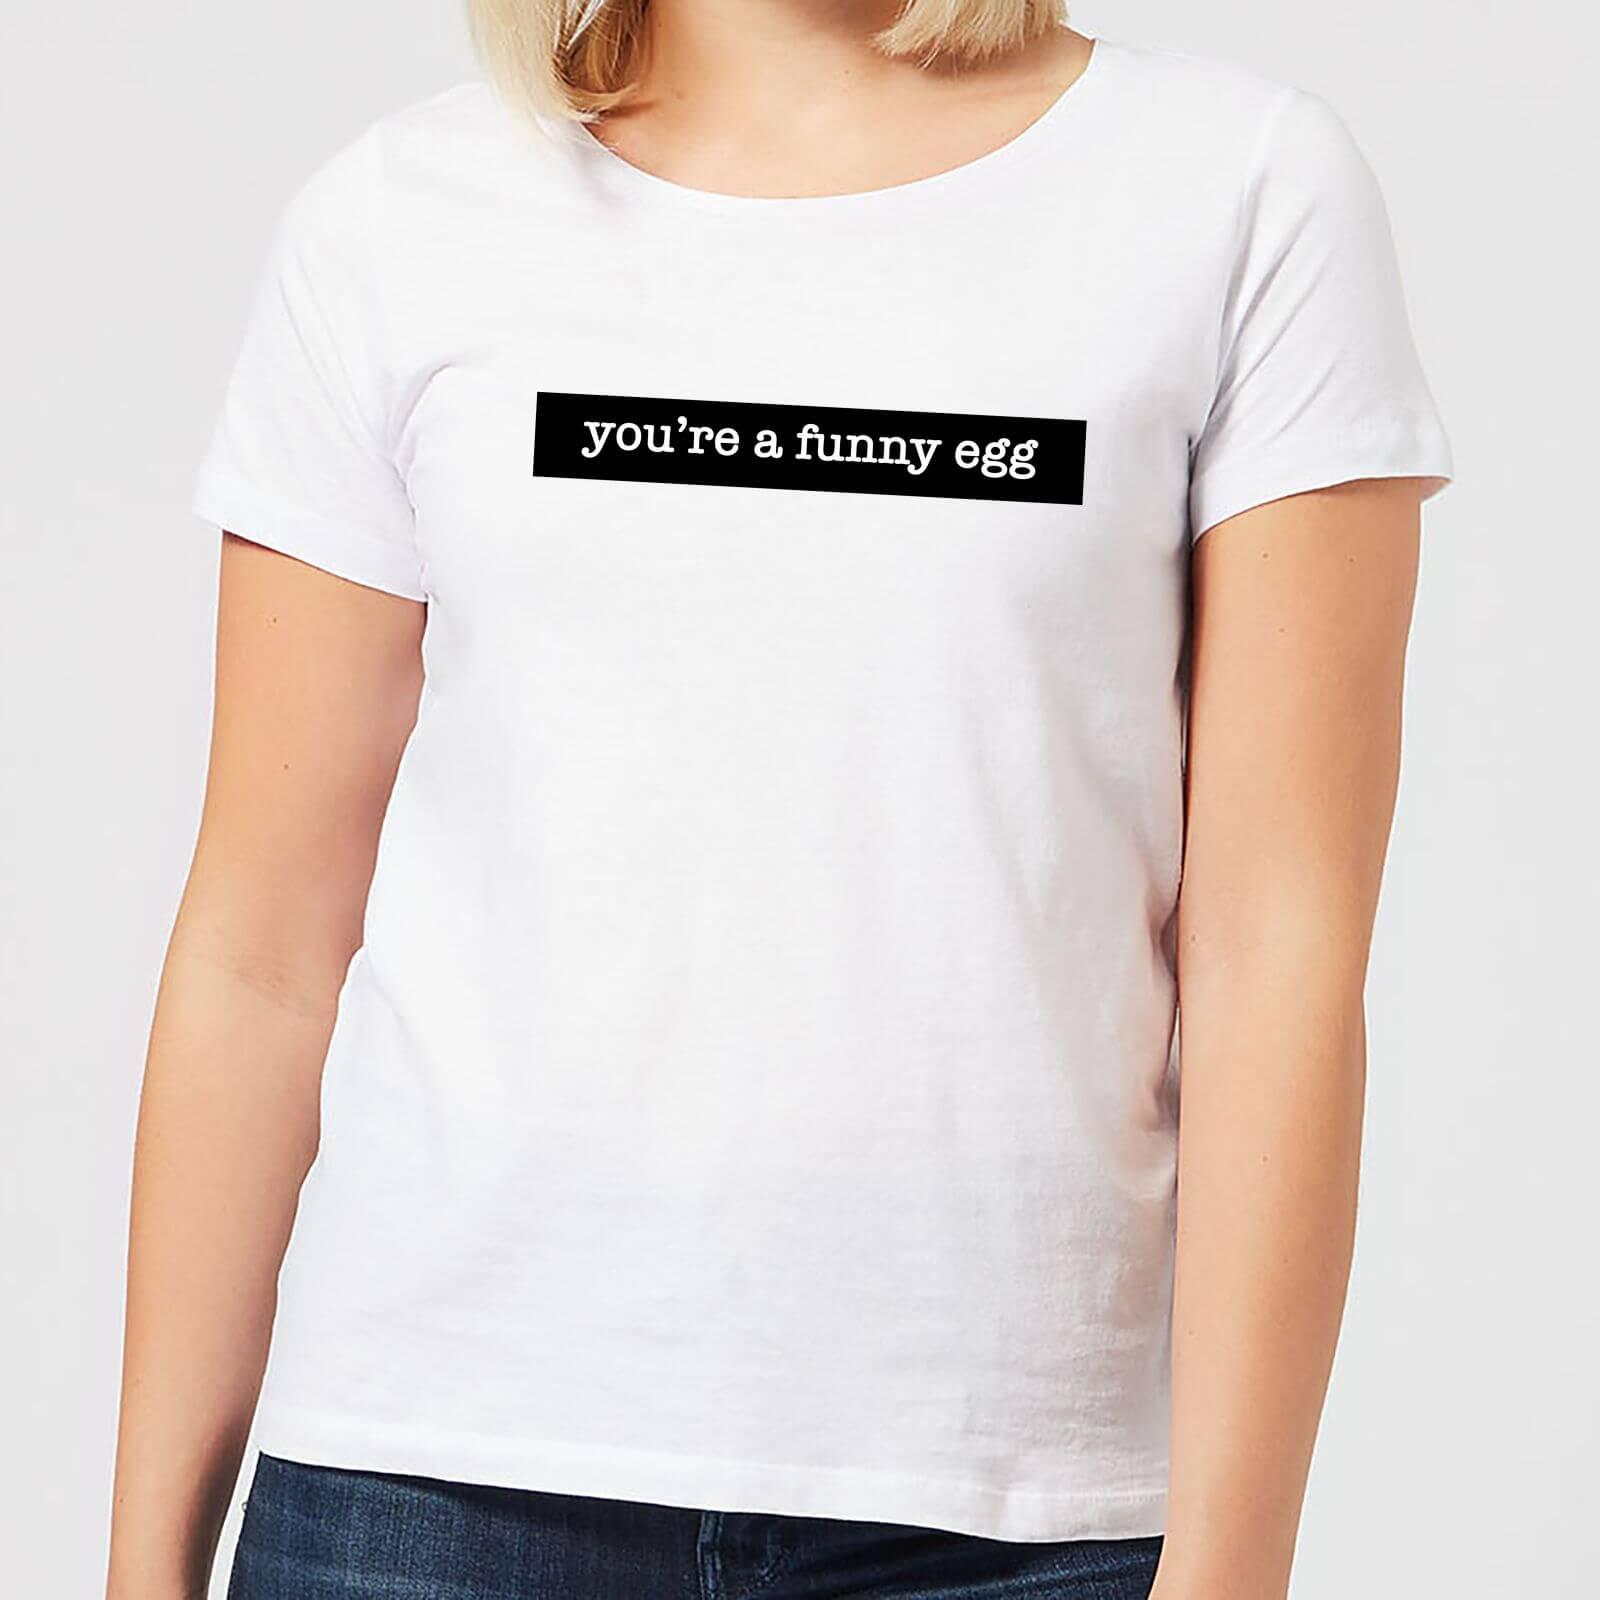 IWOOT You're A Funny Egg Women's T-Shirt - White - 5XL - White